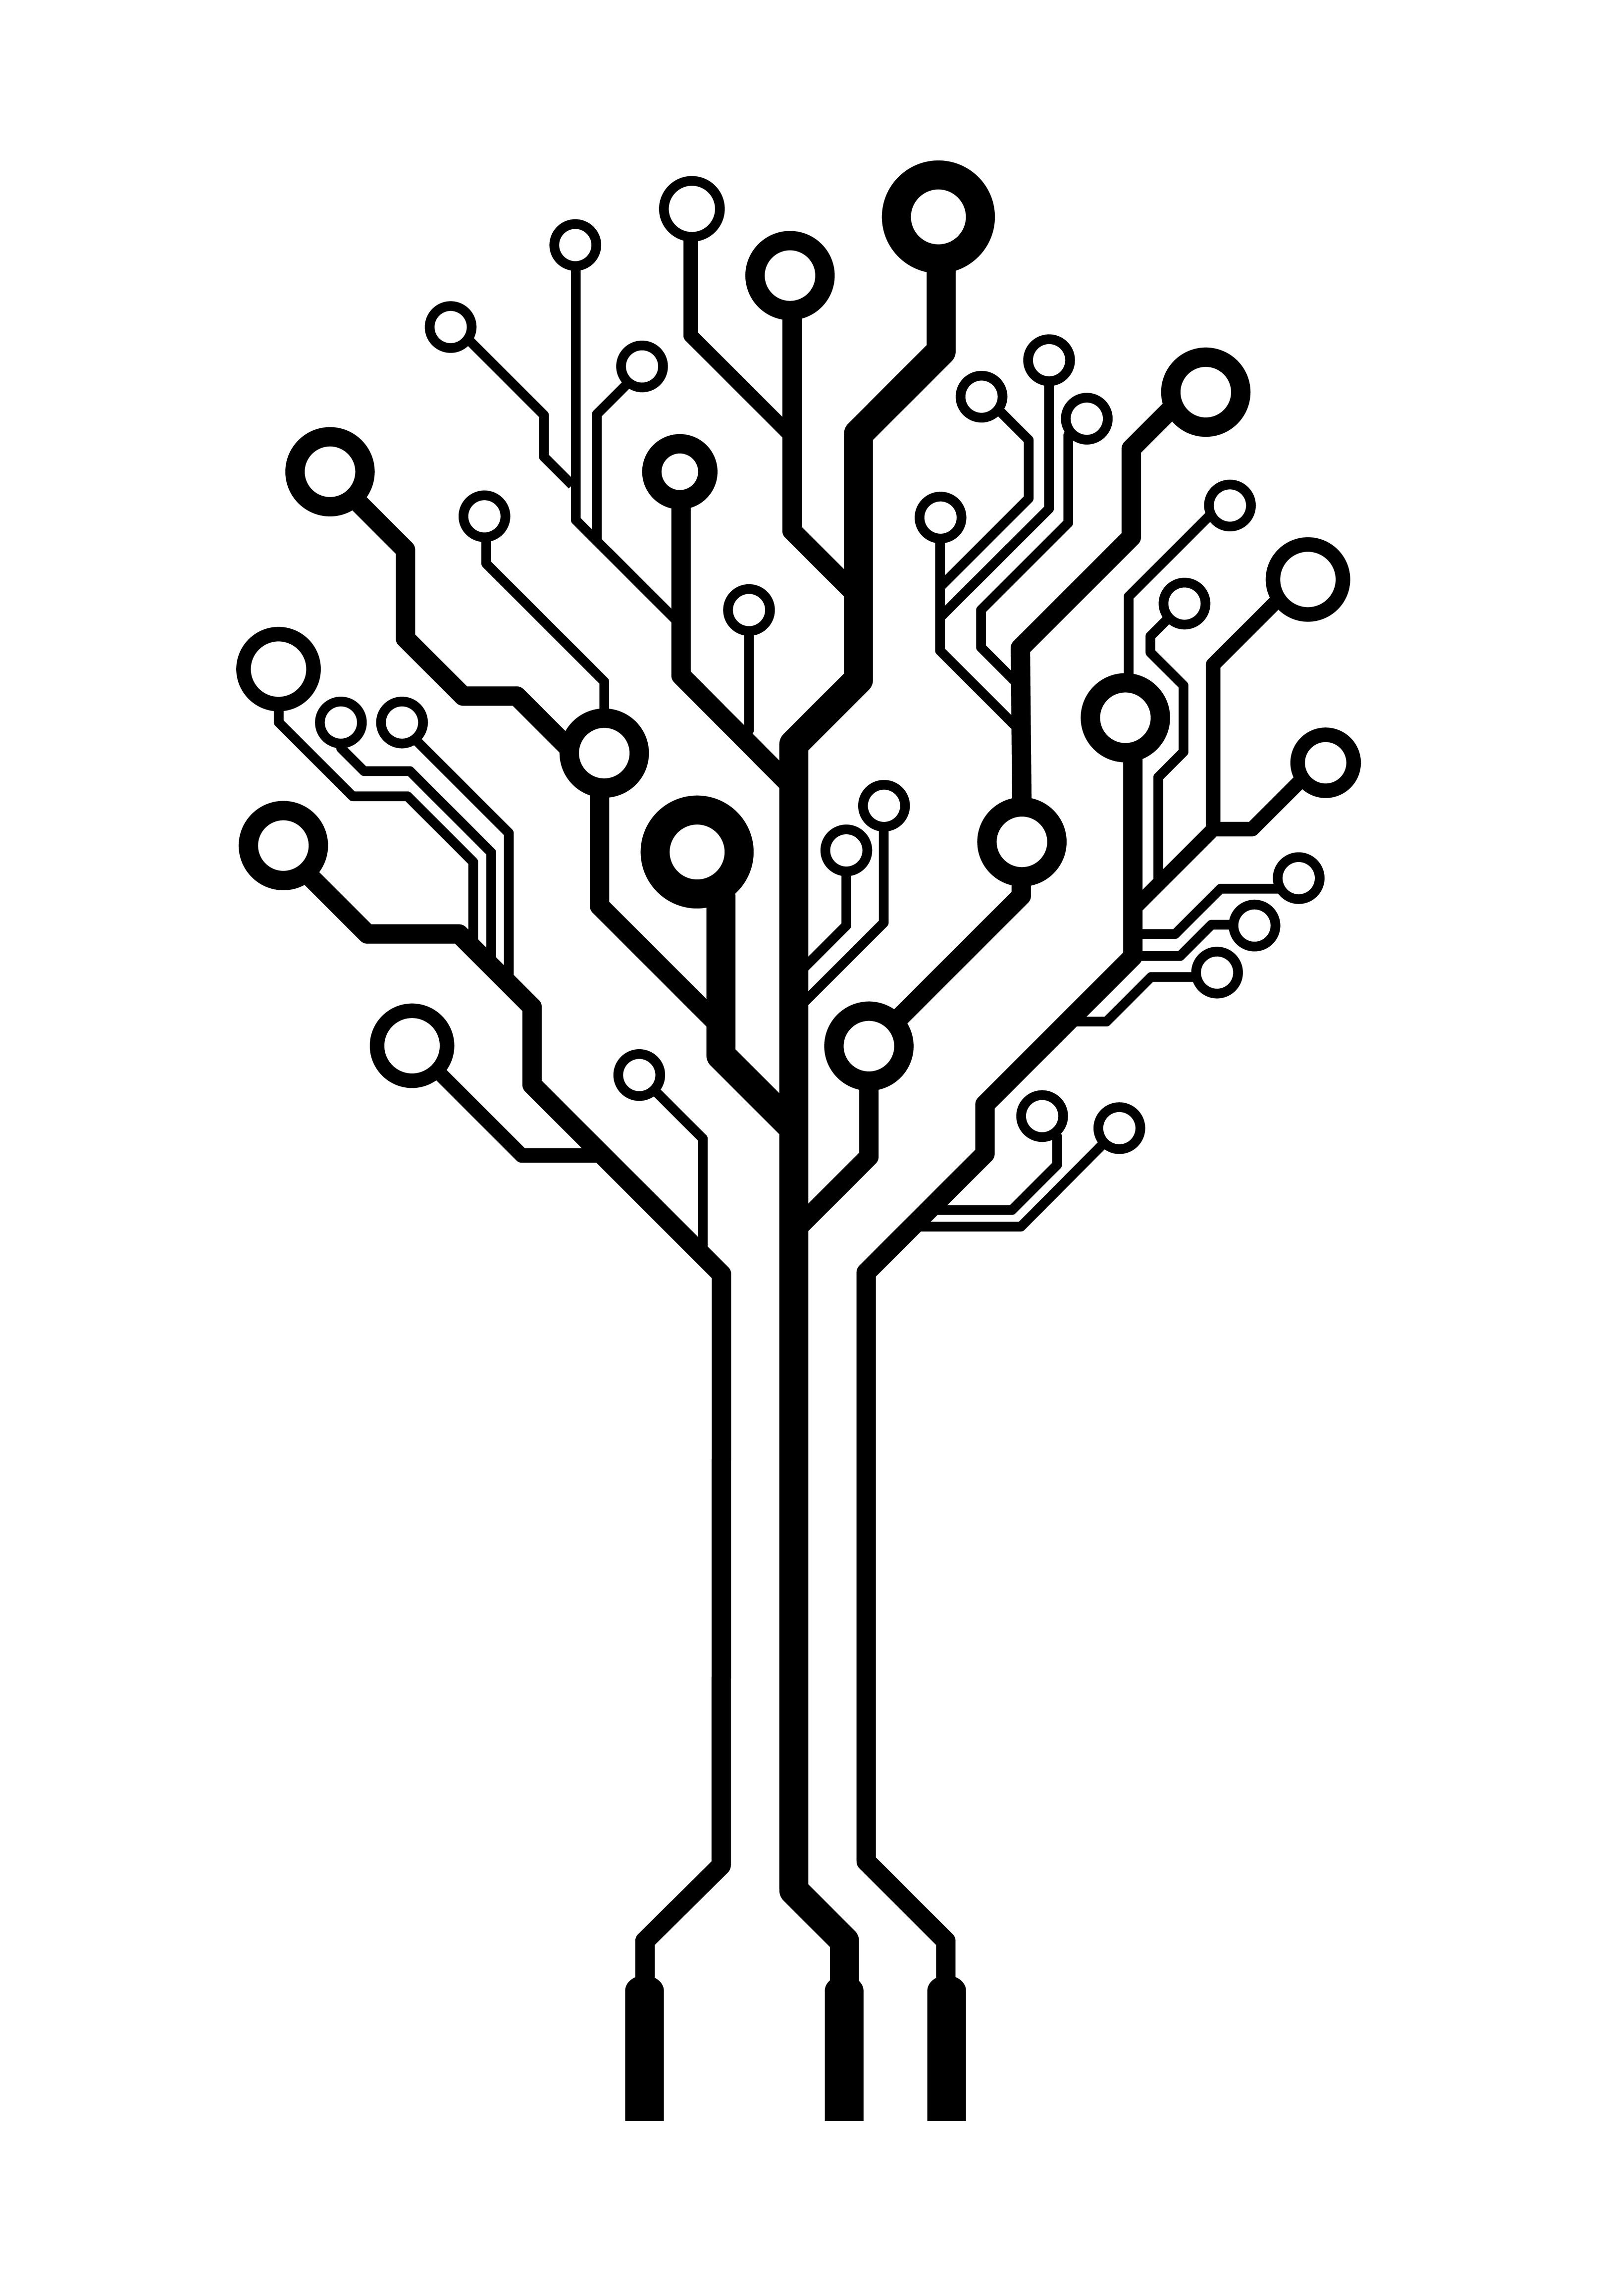 Circuitboard Tree  S&246k P&229 Google Mixed Art Pinterest